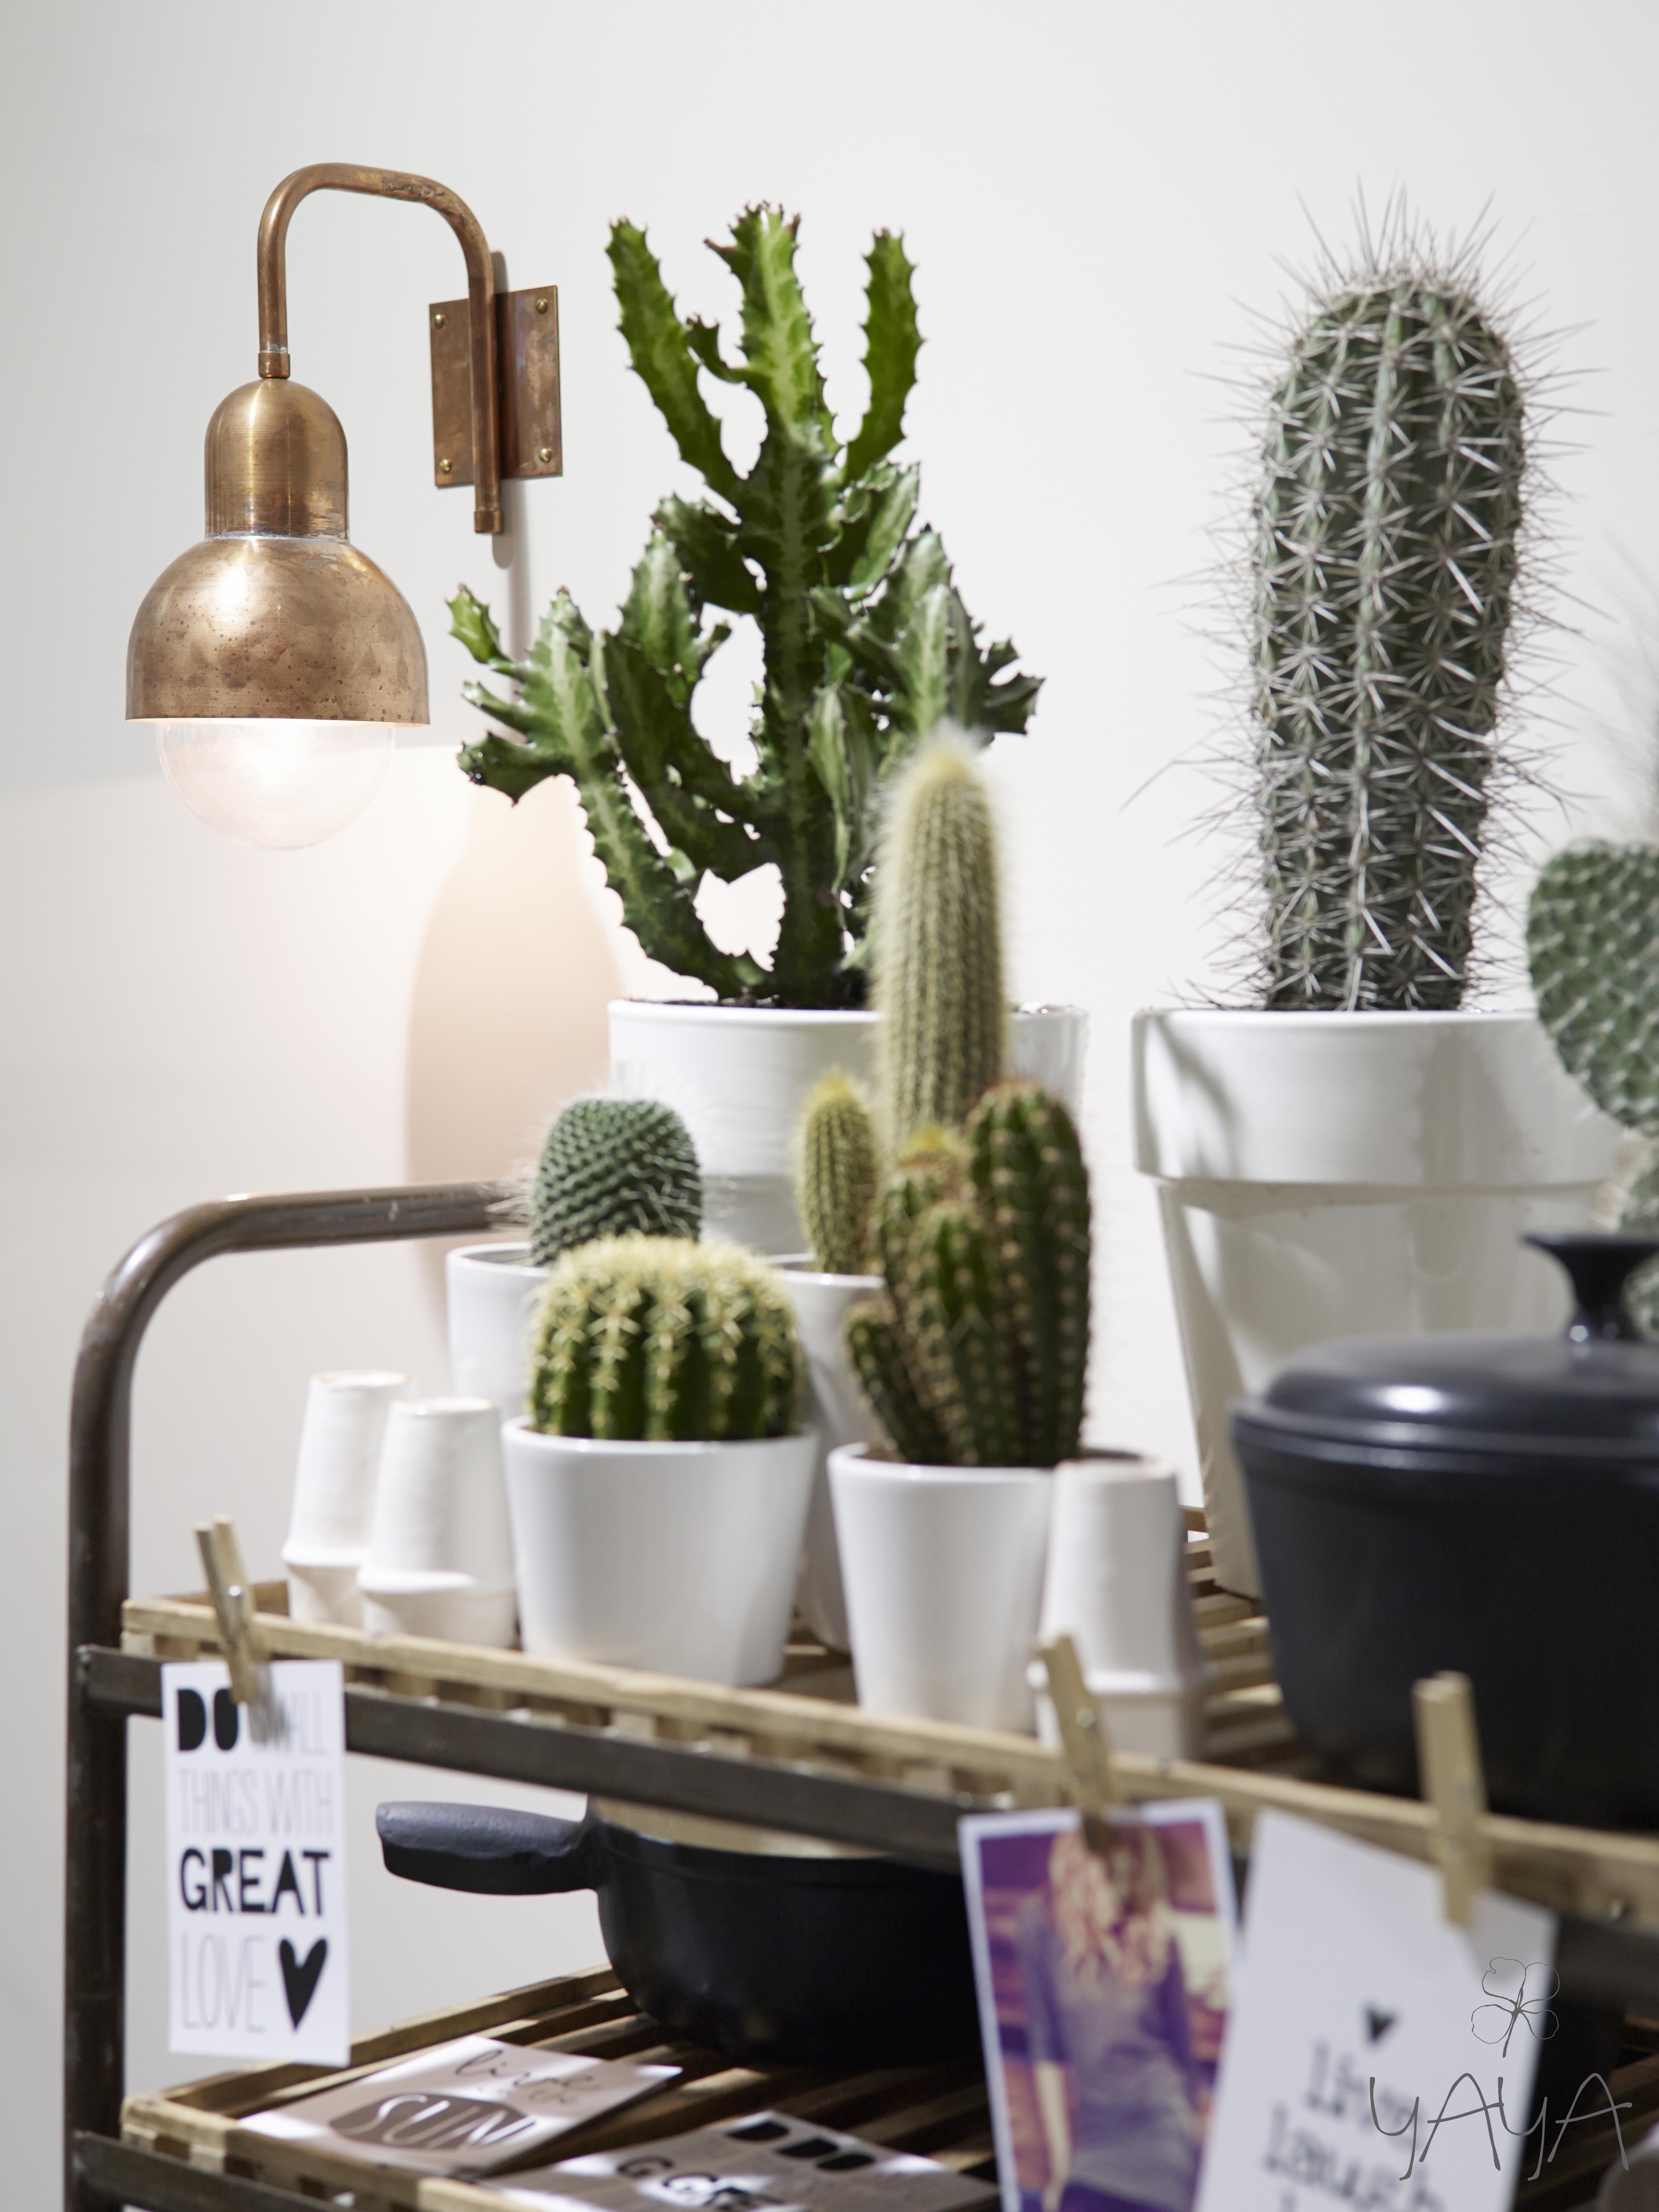 Ams Lax Cactus Succulent Jardins Cactus Plante Interieur